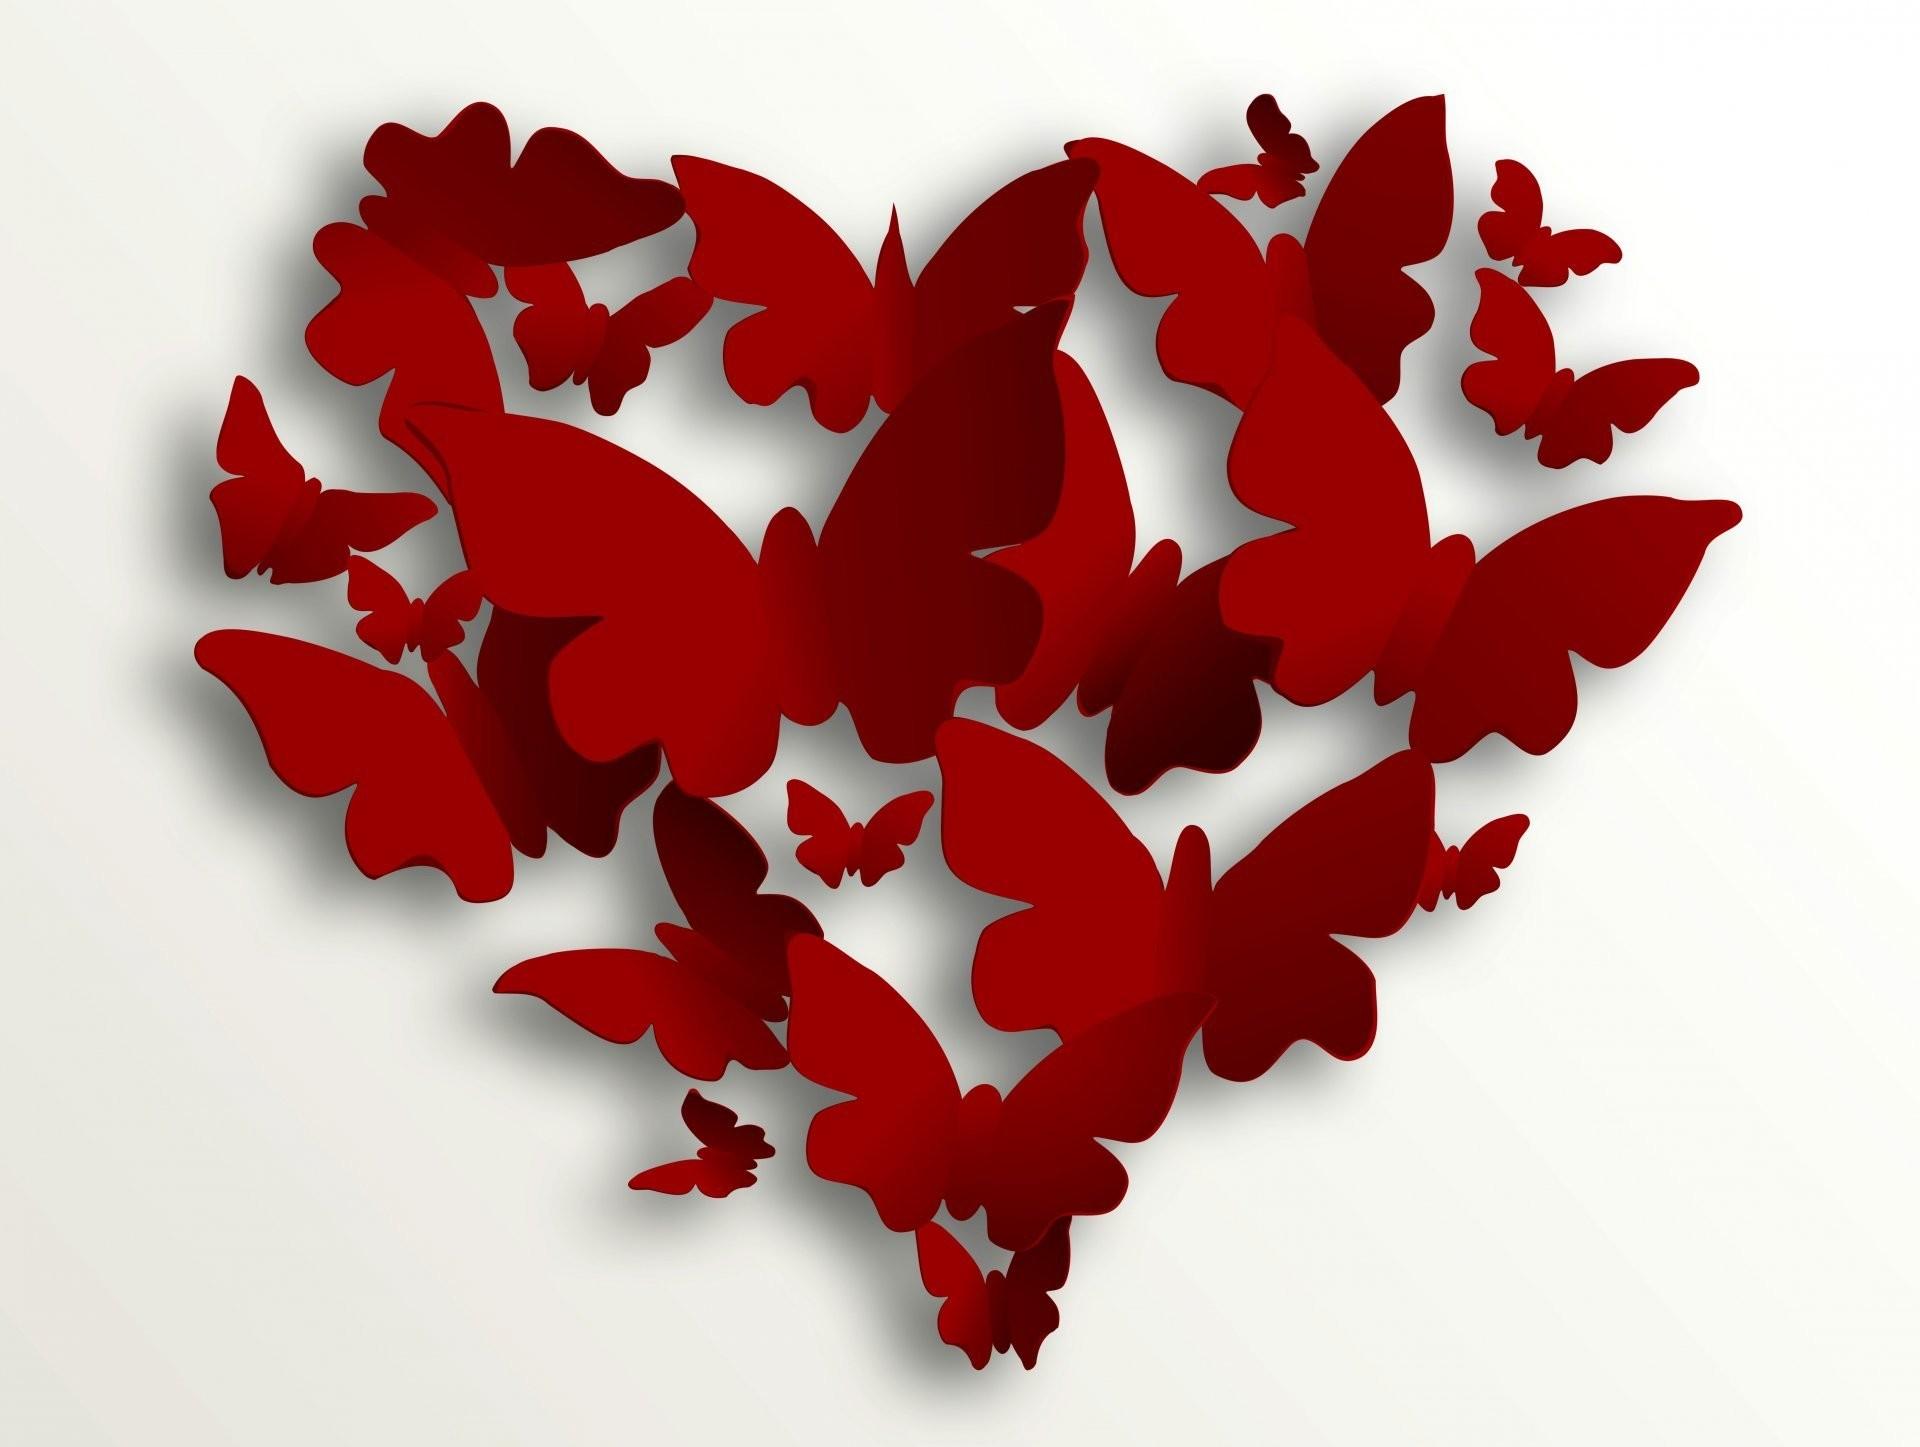 valentine's day love heart romantic heart butterfly